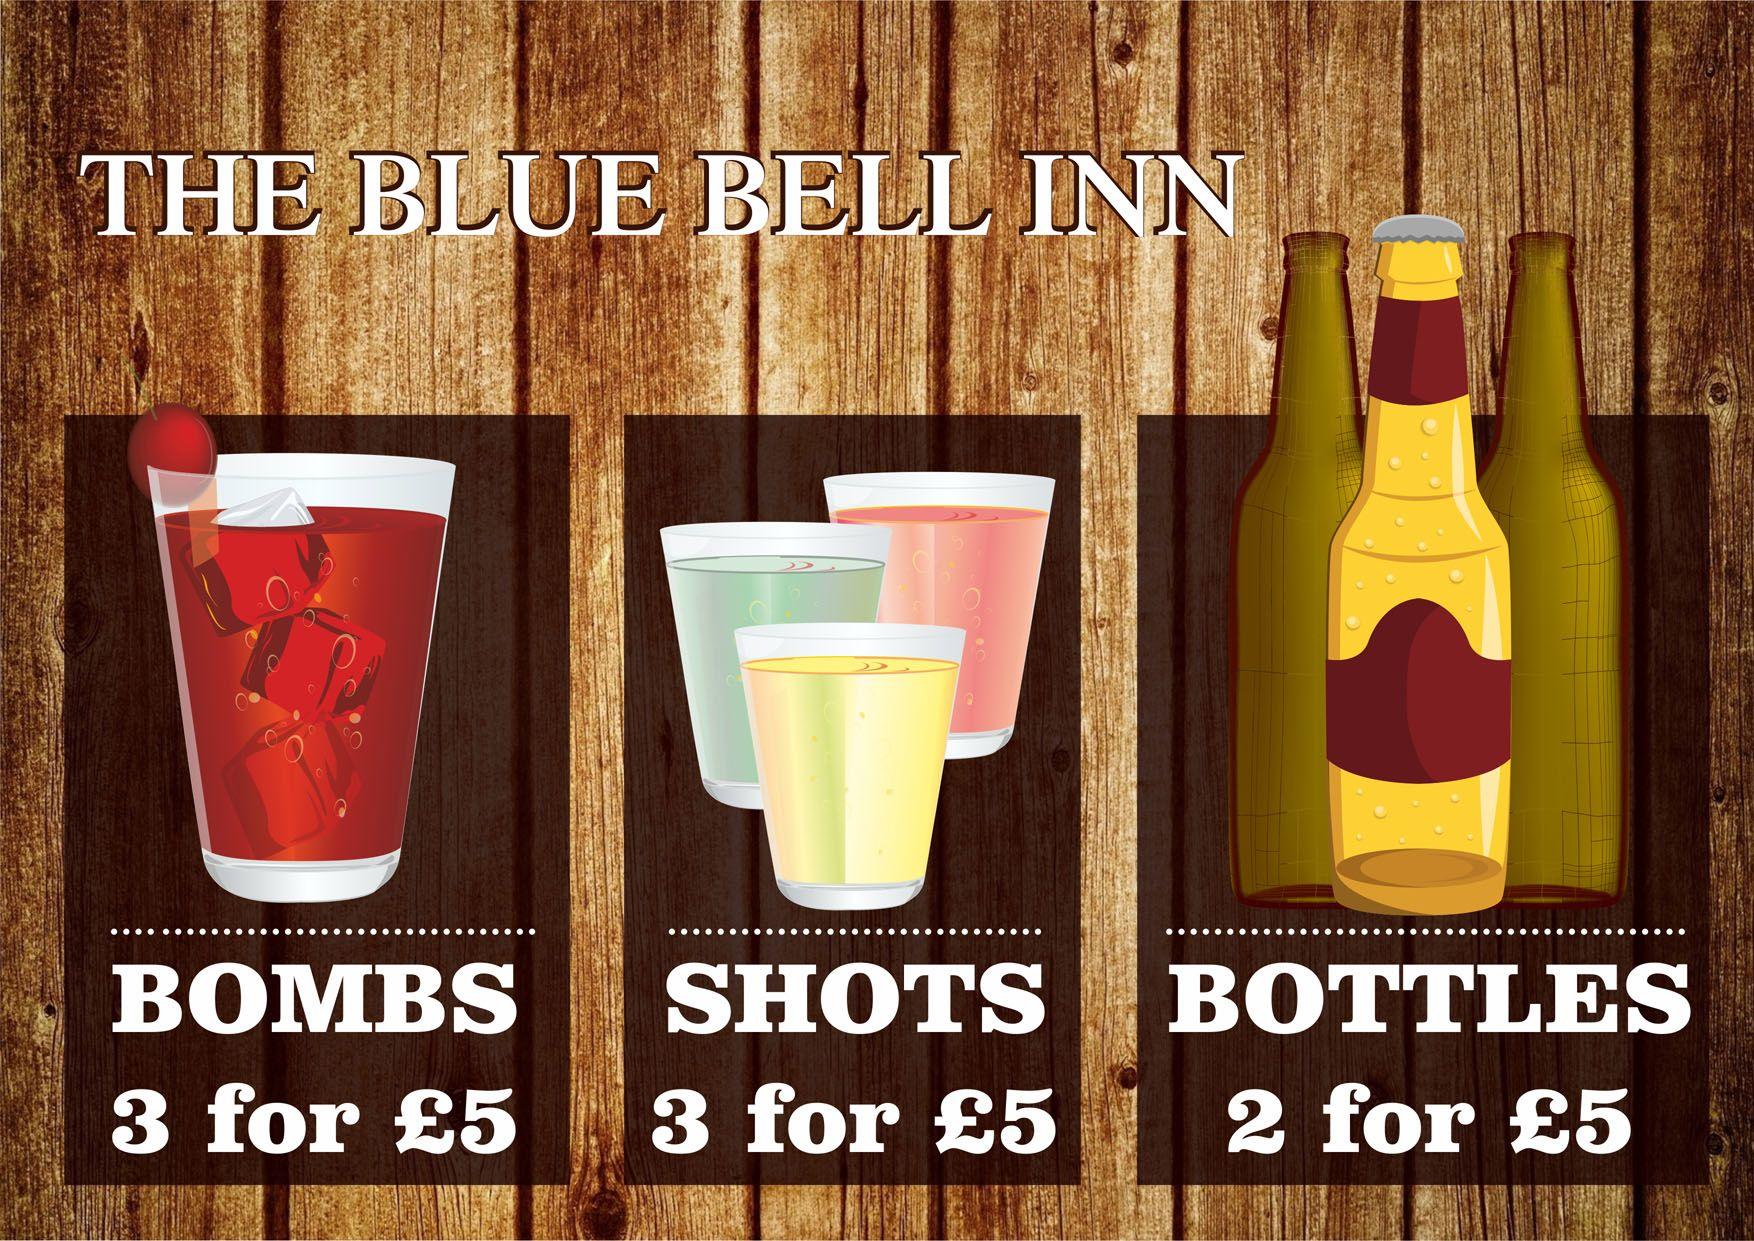 Poster design nottingham - Graphic Design Of A4 Flyer For The Blue Bell Inn Nottingham Designed By Minuteman Press